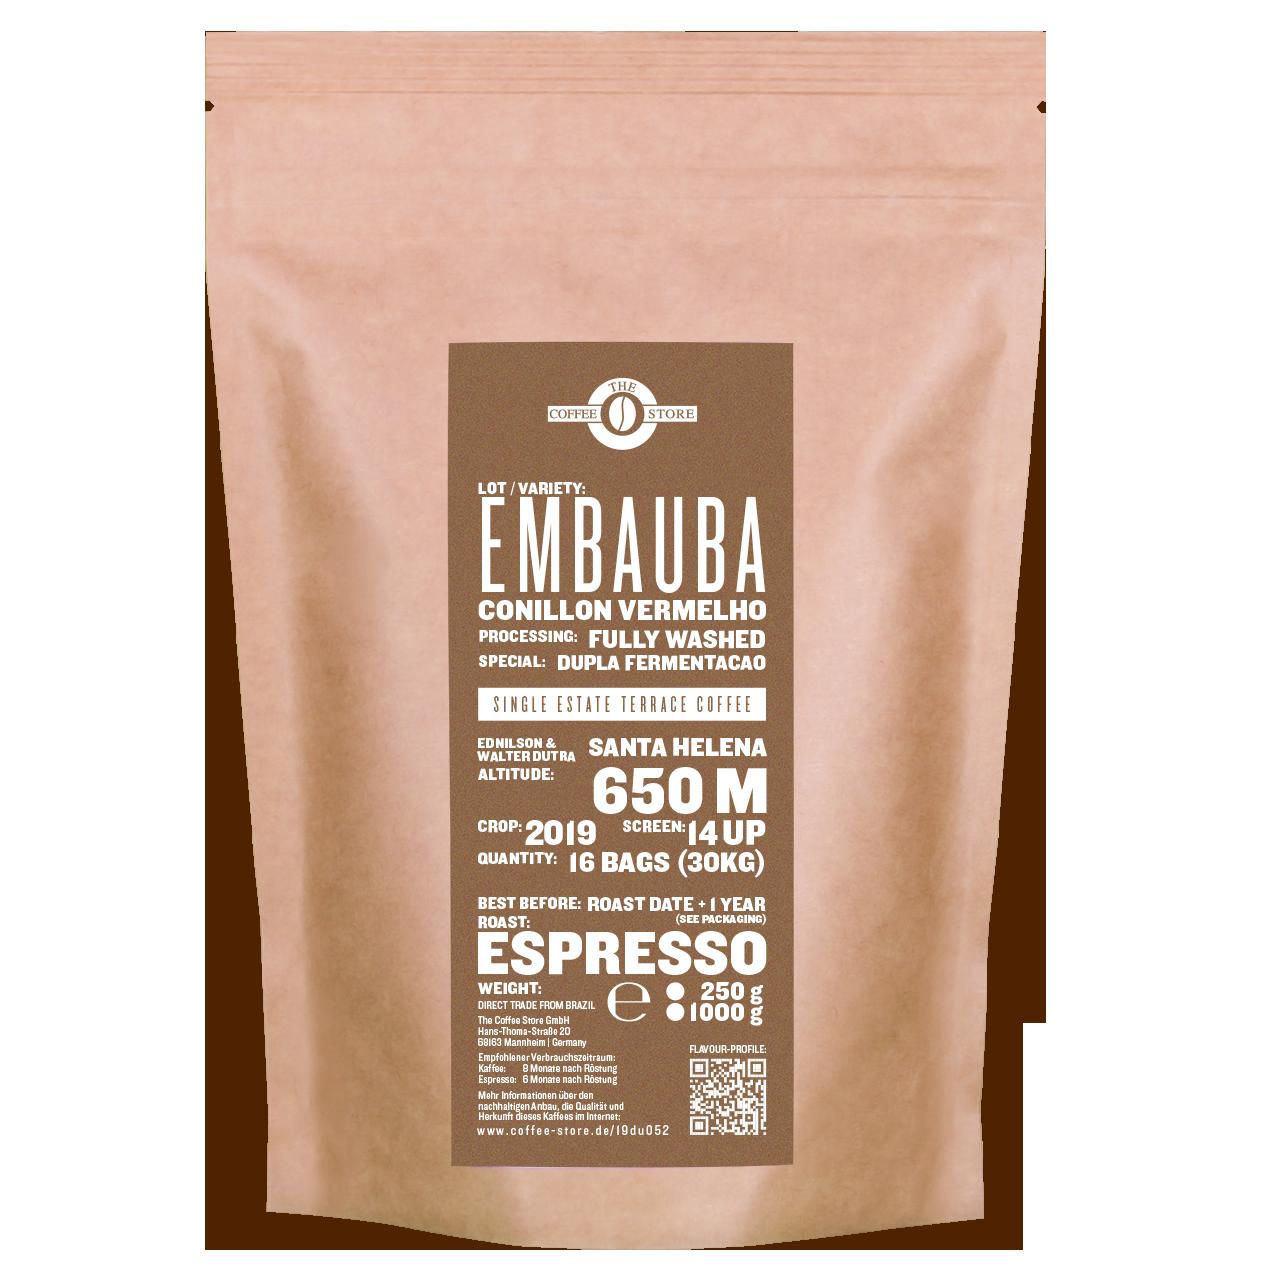 Embauba, Conillon vermelho - Espressoröstung